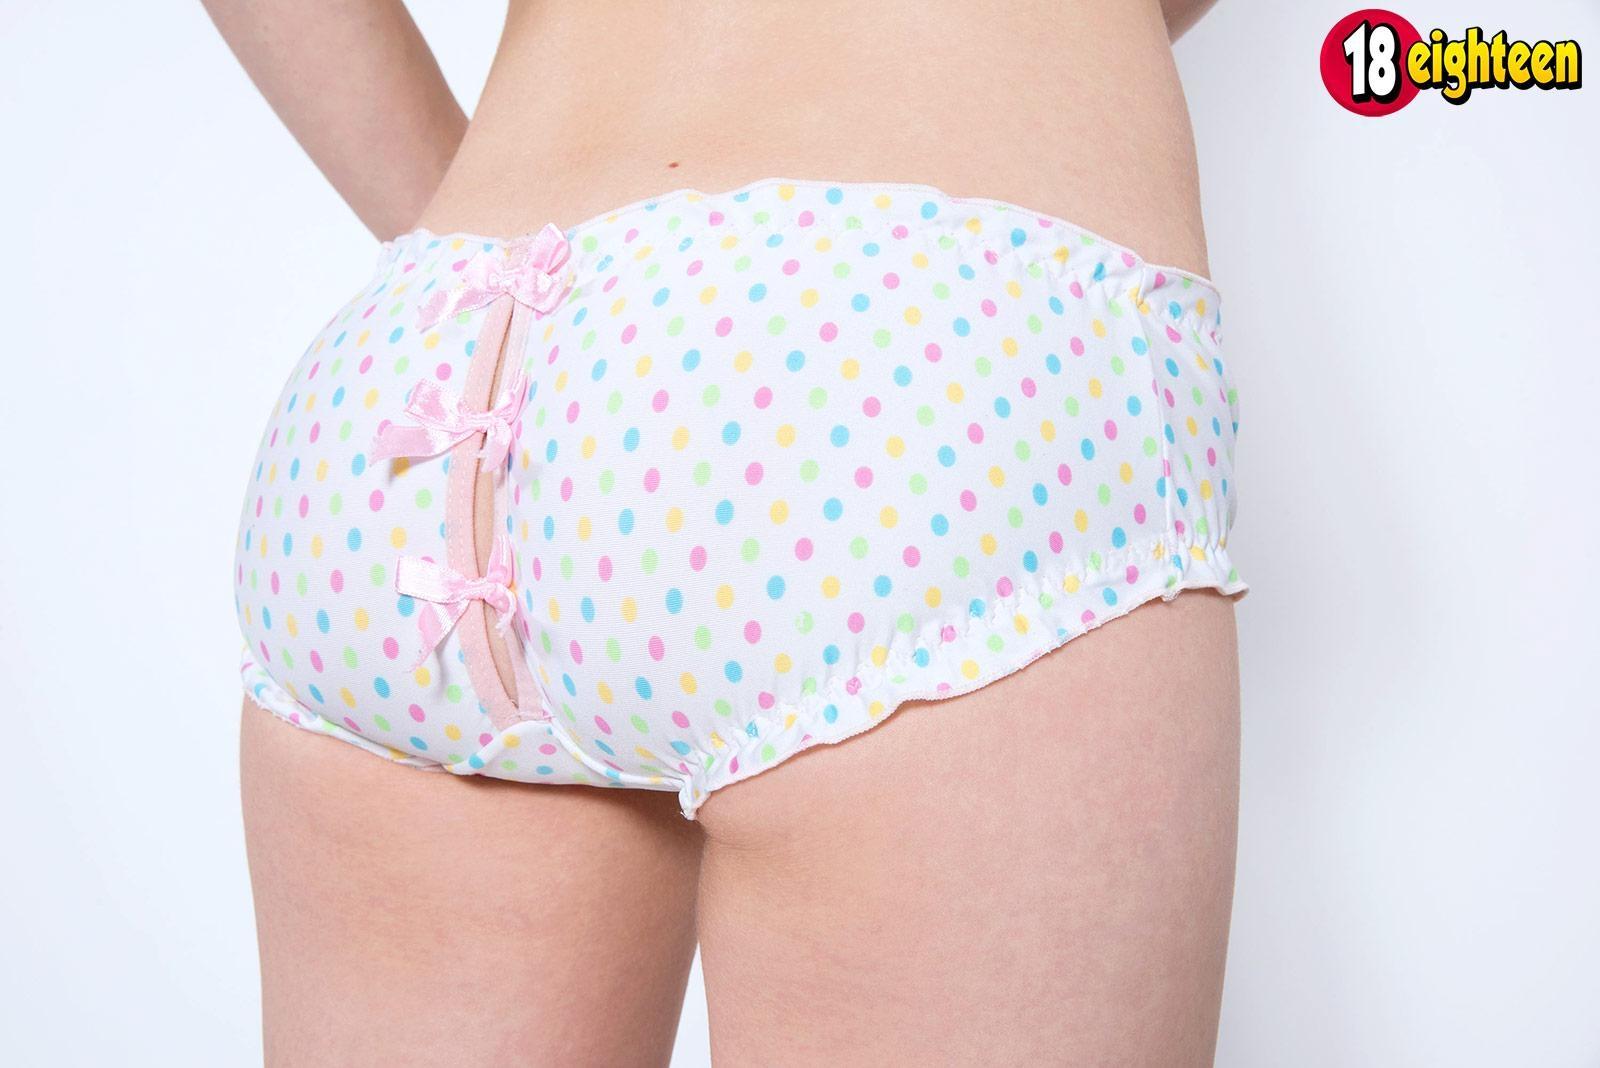 Redheaded teen pornstar Dolly Little exposing small breasts in cute panties